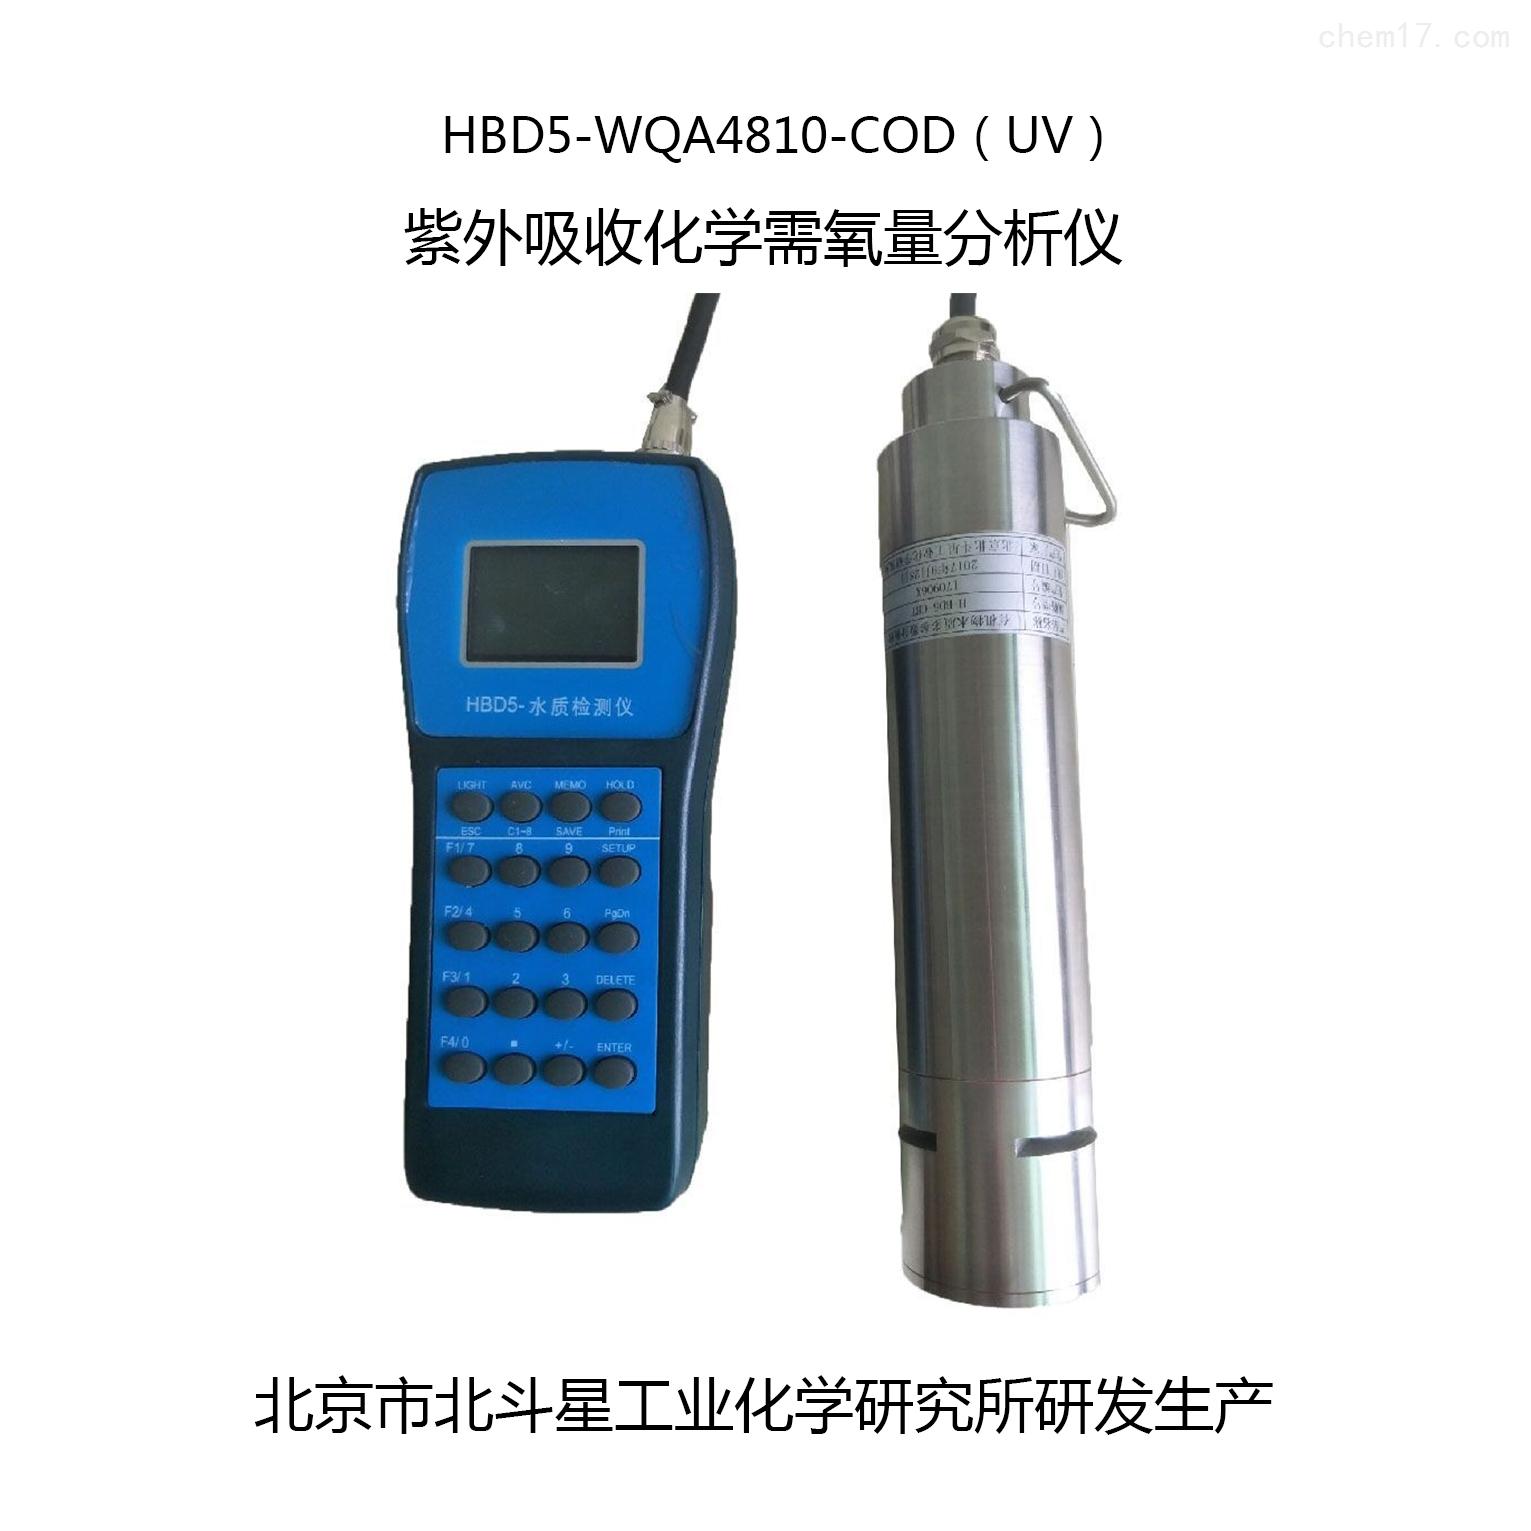 便携式UV法COD分析仪 HBD5-WQA4810-COD